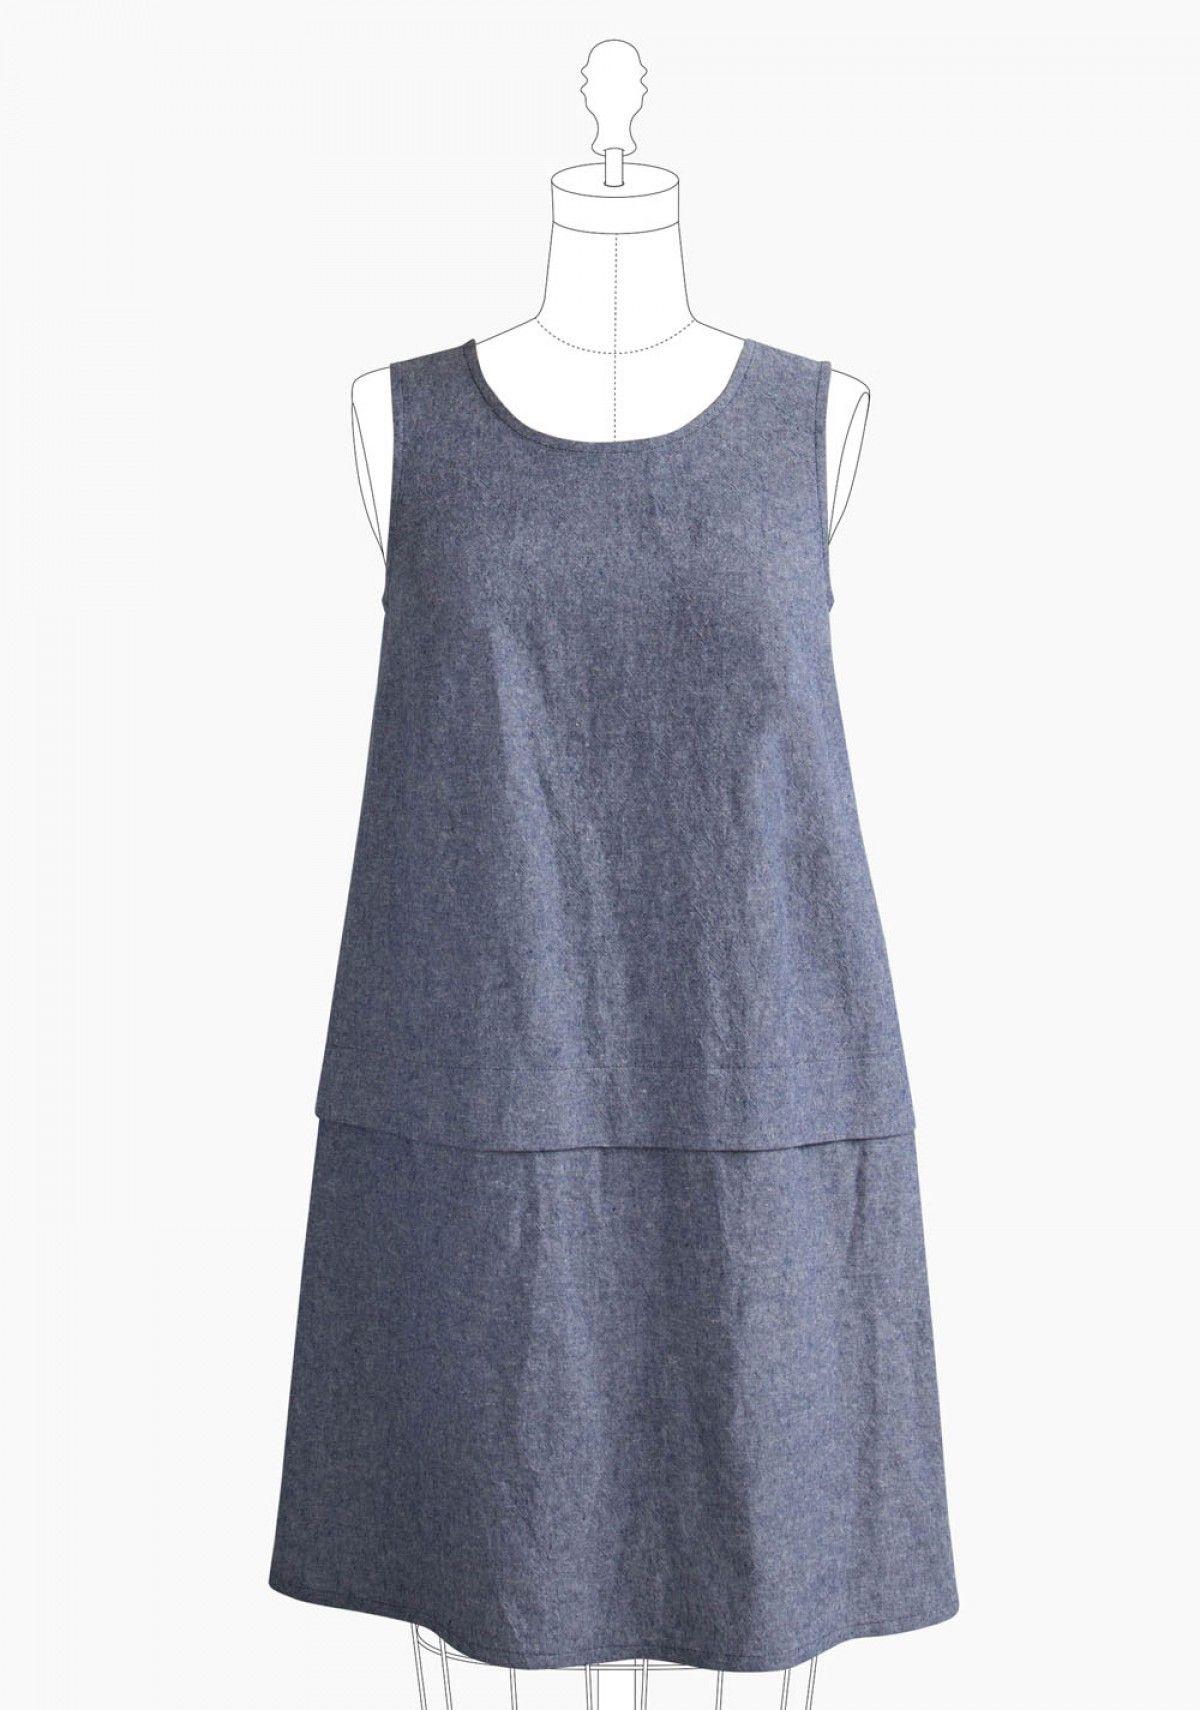 Grainline Studio Willow Tank Dress Pattern   Nähanleitung und Nähen